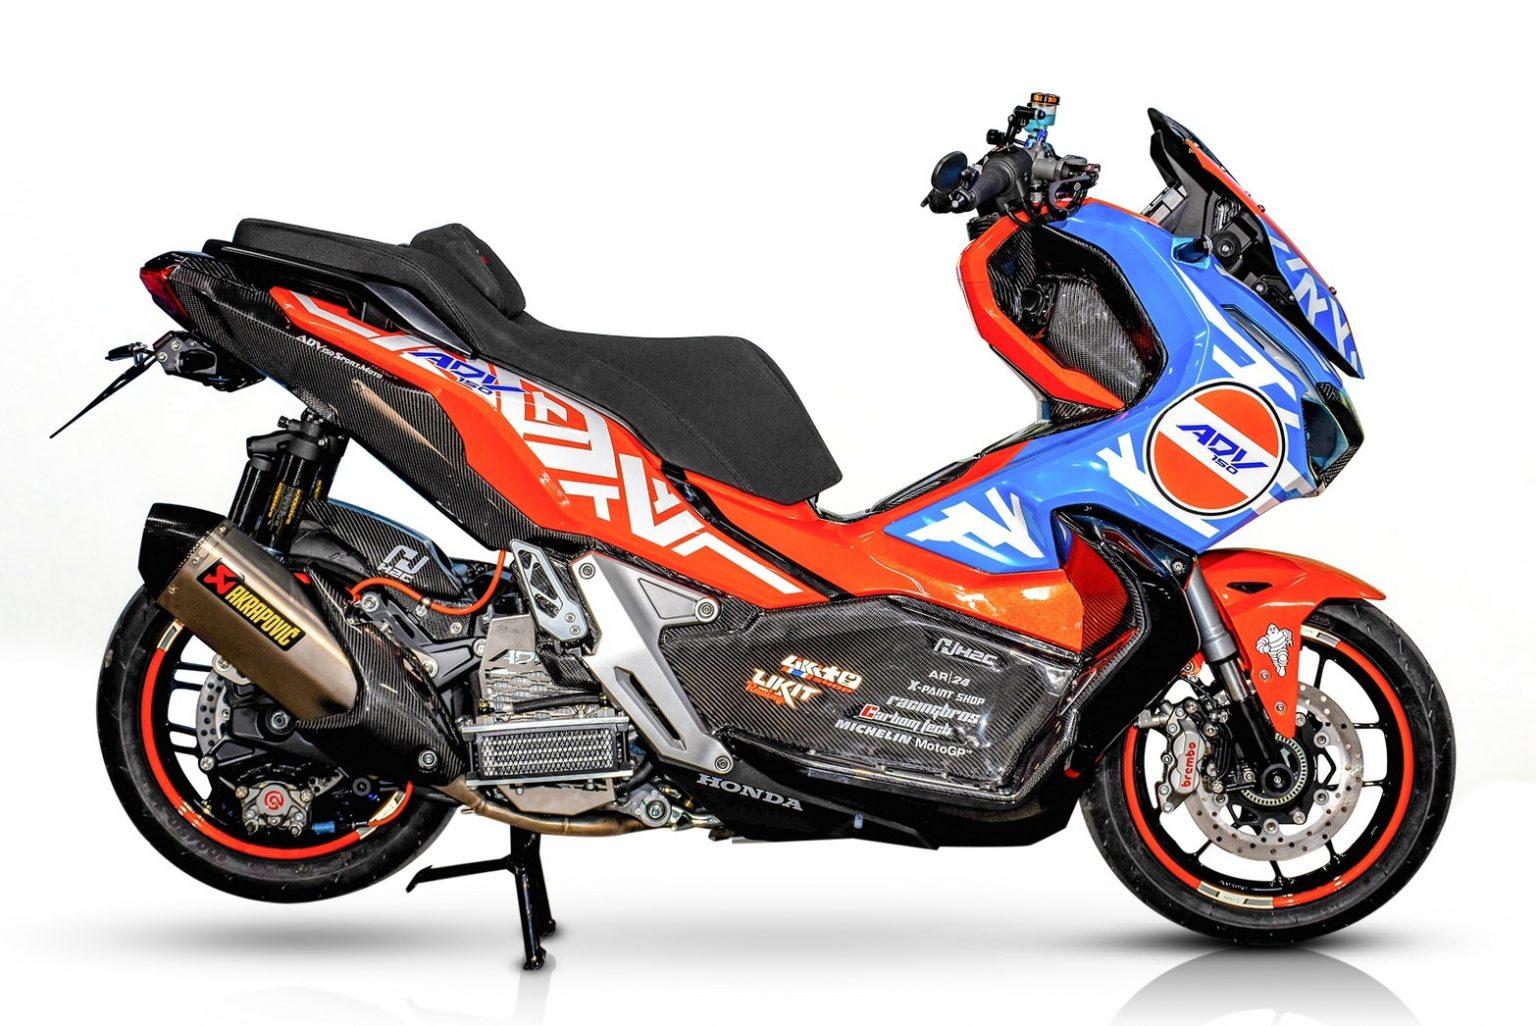 Honda ADV 150 2021 bản thể thao